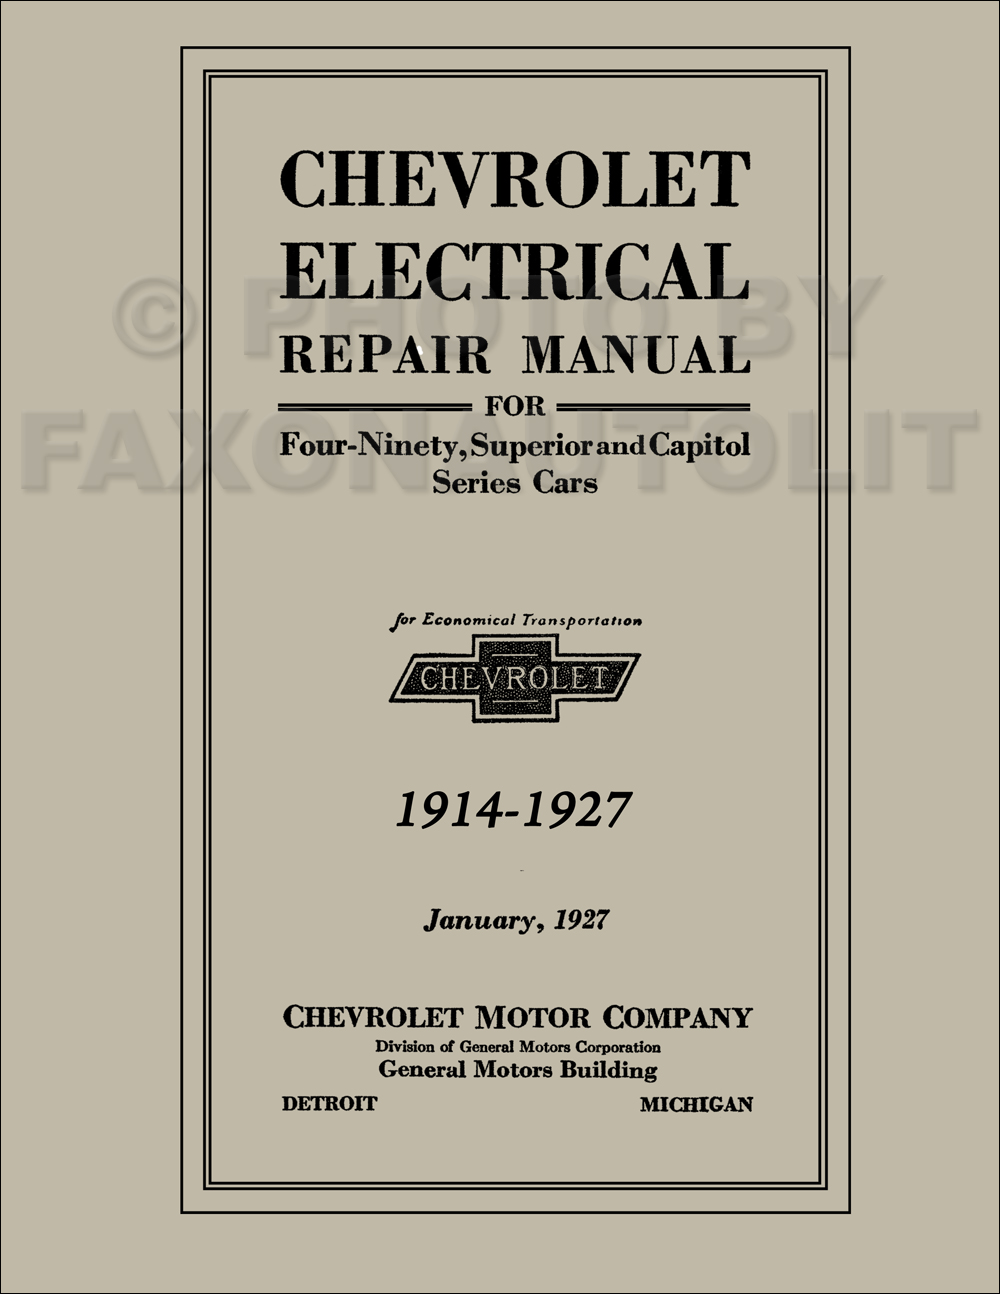 hight resolution of 1926 chevrolet wiring diagram wire management wiring diagram 1926 chevy wiring diagram